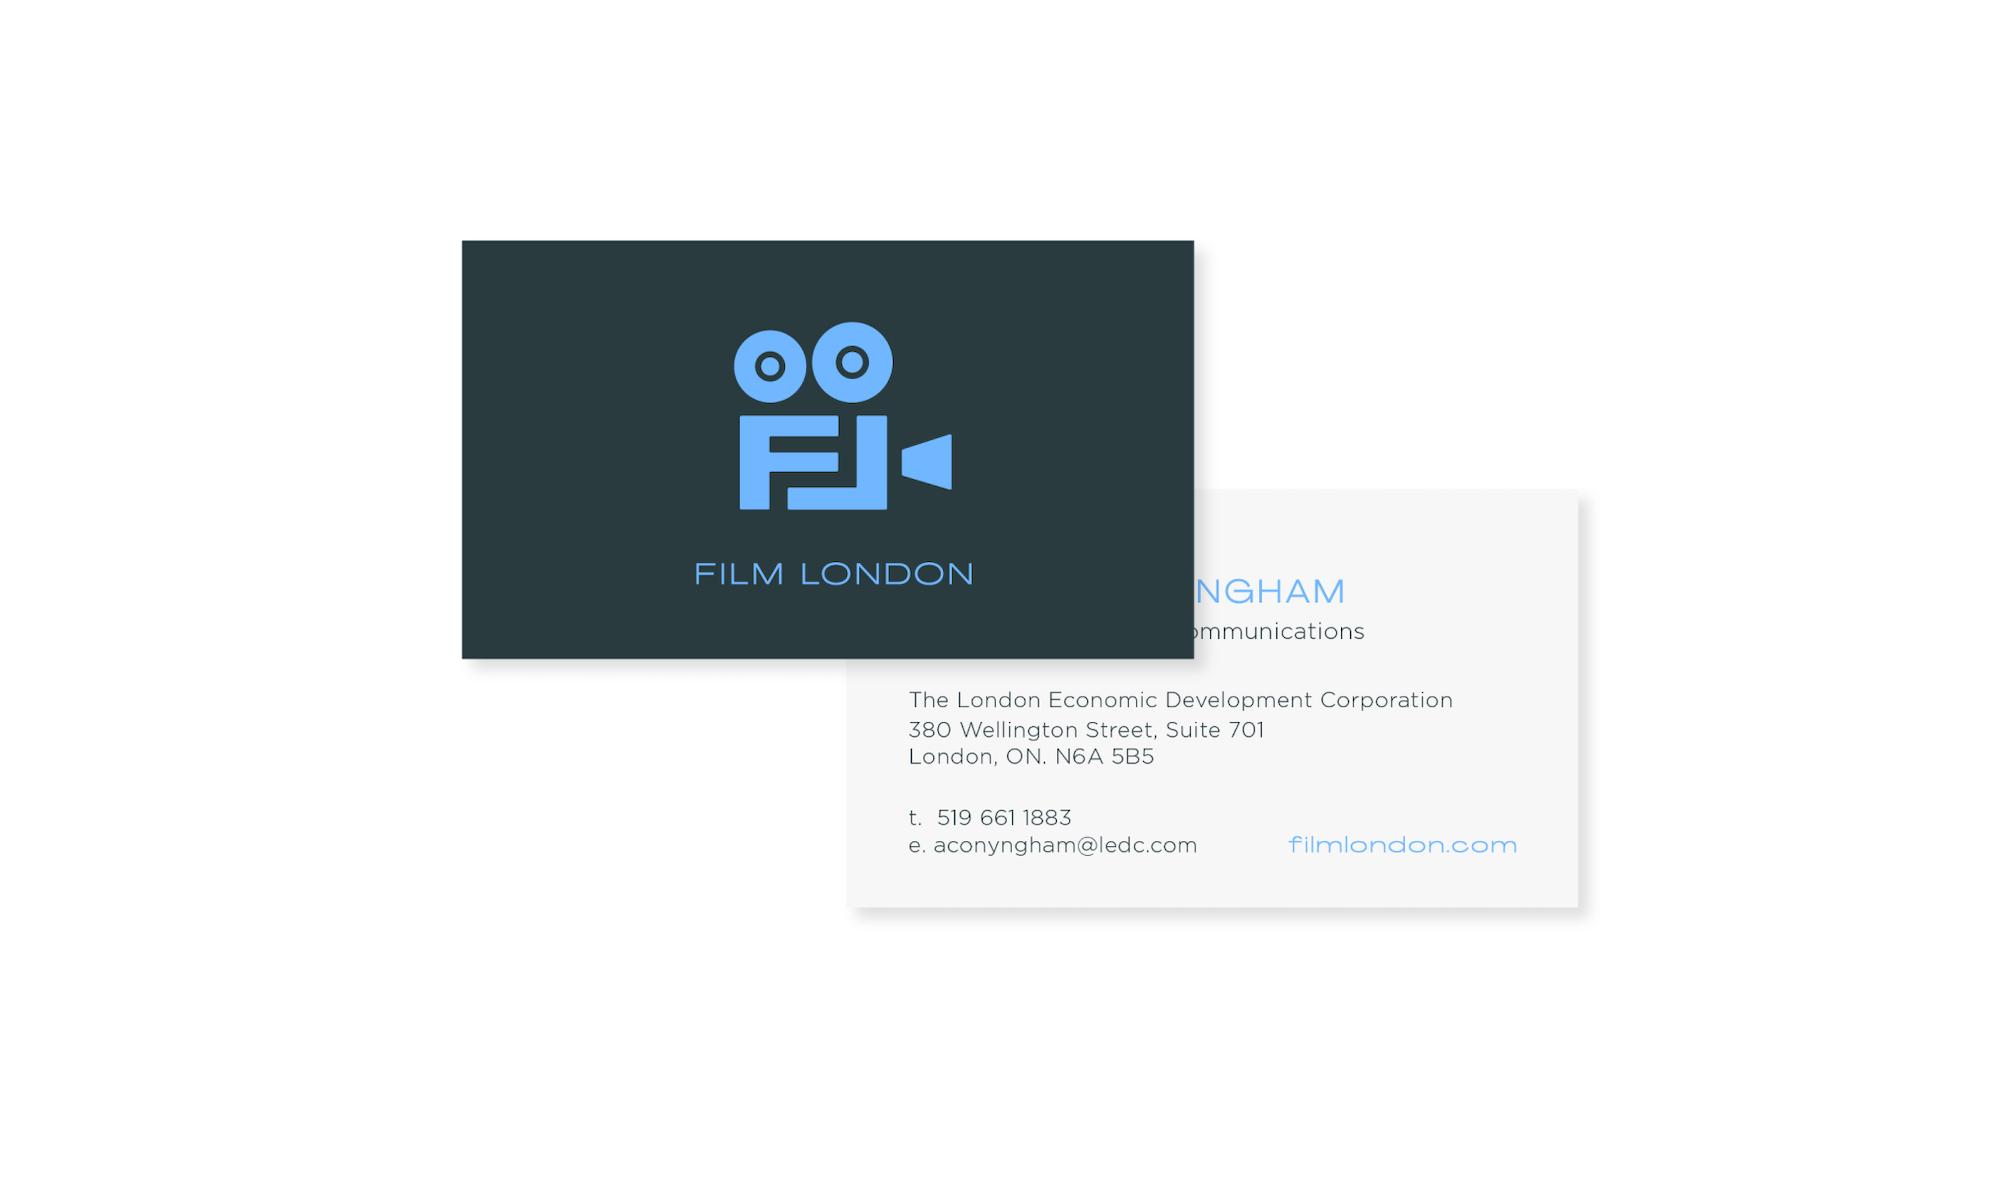 Film London business card